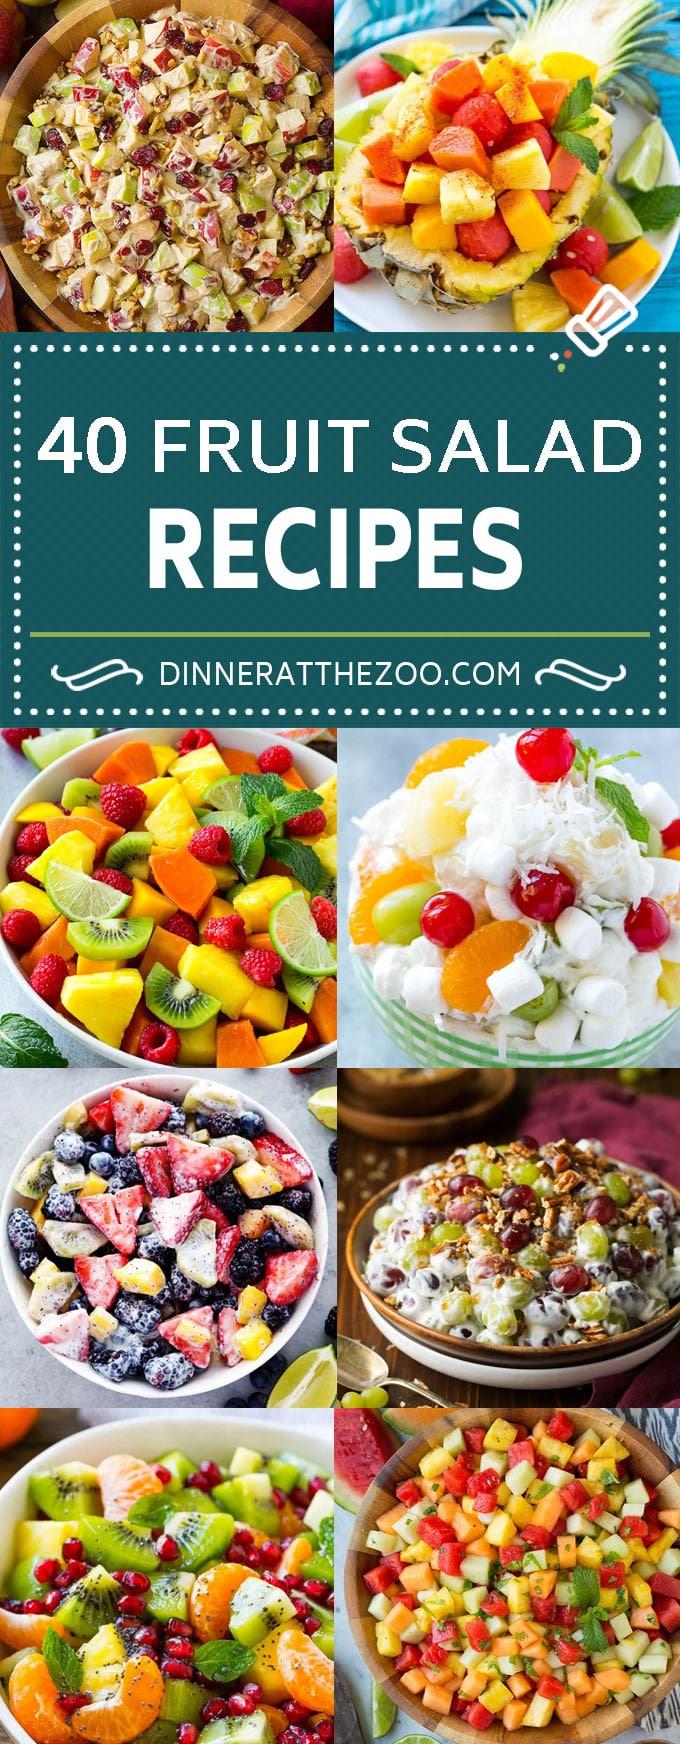 Fruit Salad Recipes | Creamy Fruit Salad | Easy Fruit Salad | Healthy Fruit Salad #fruit #salad #healthy #dinneratthezoo